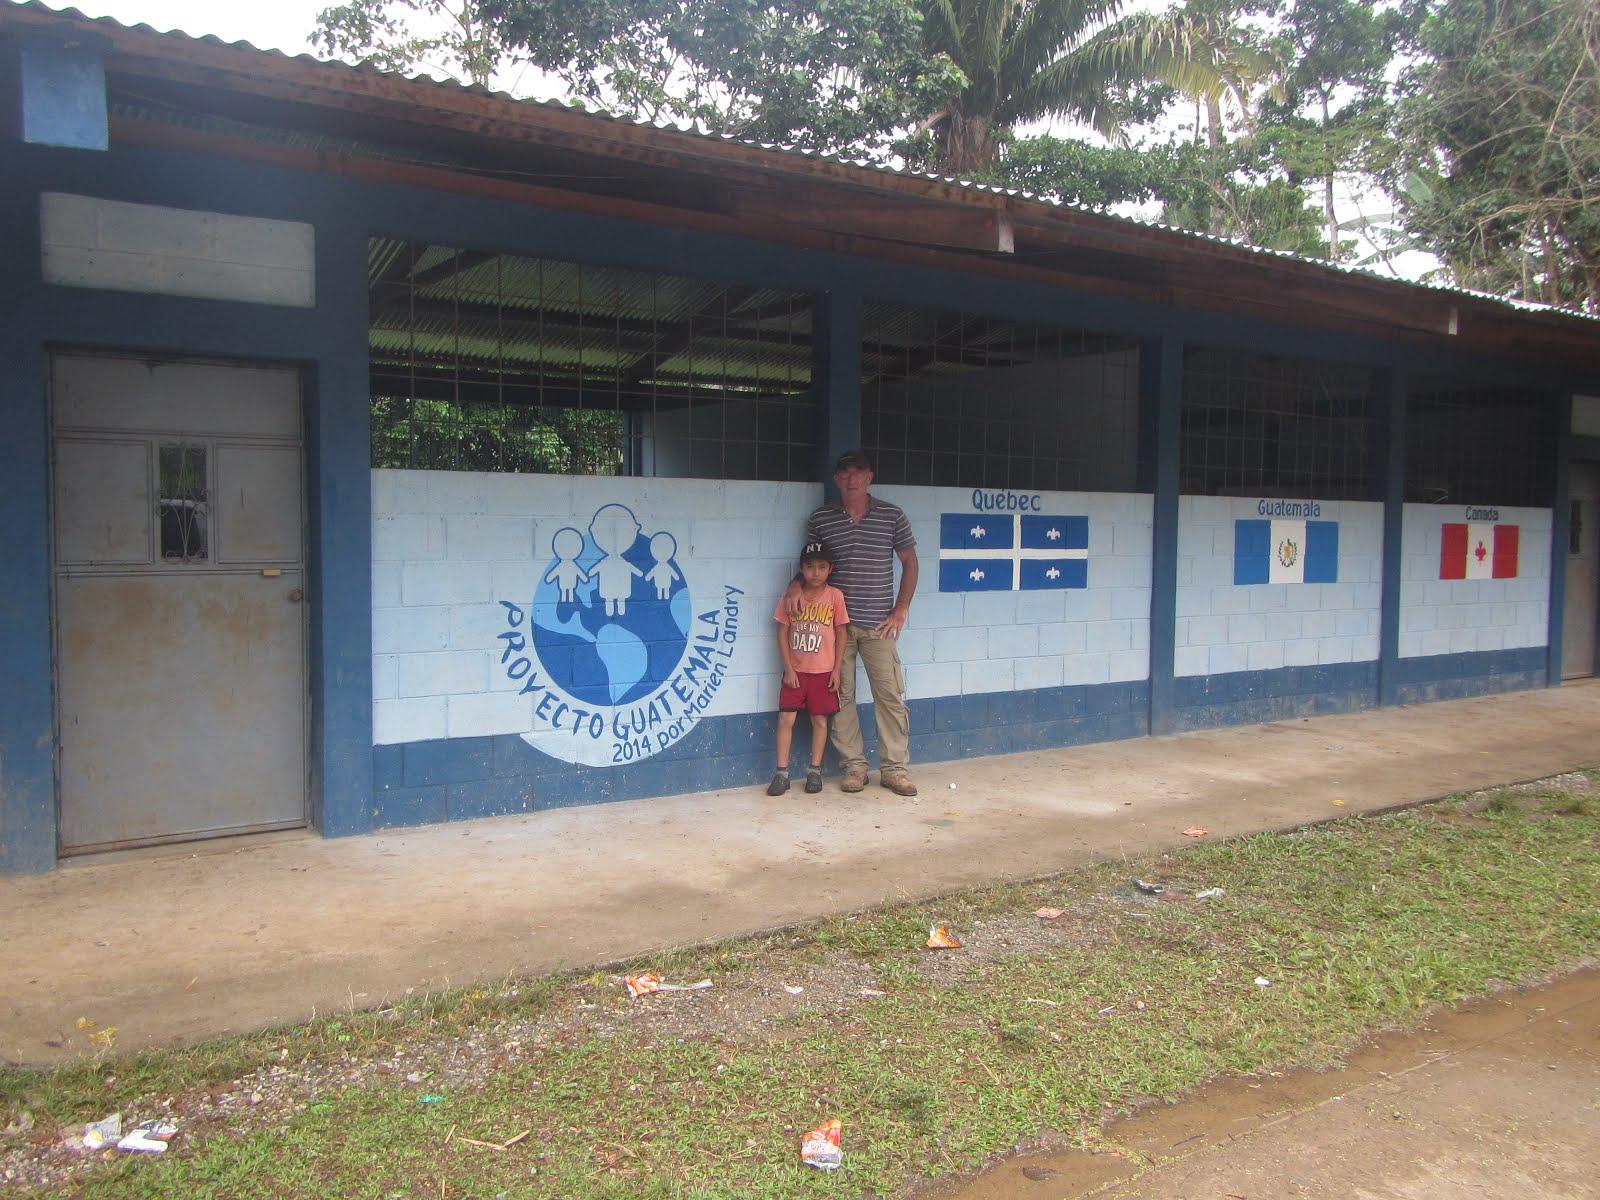 École de Sajul 2013-2014